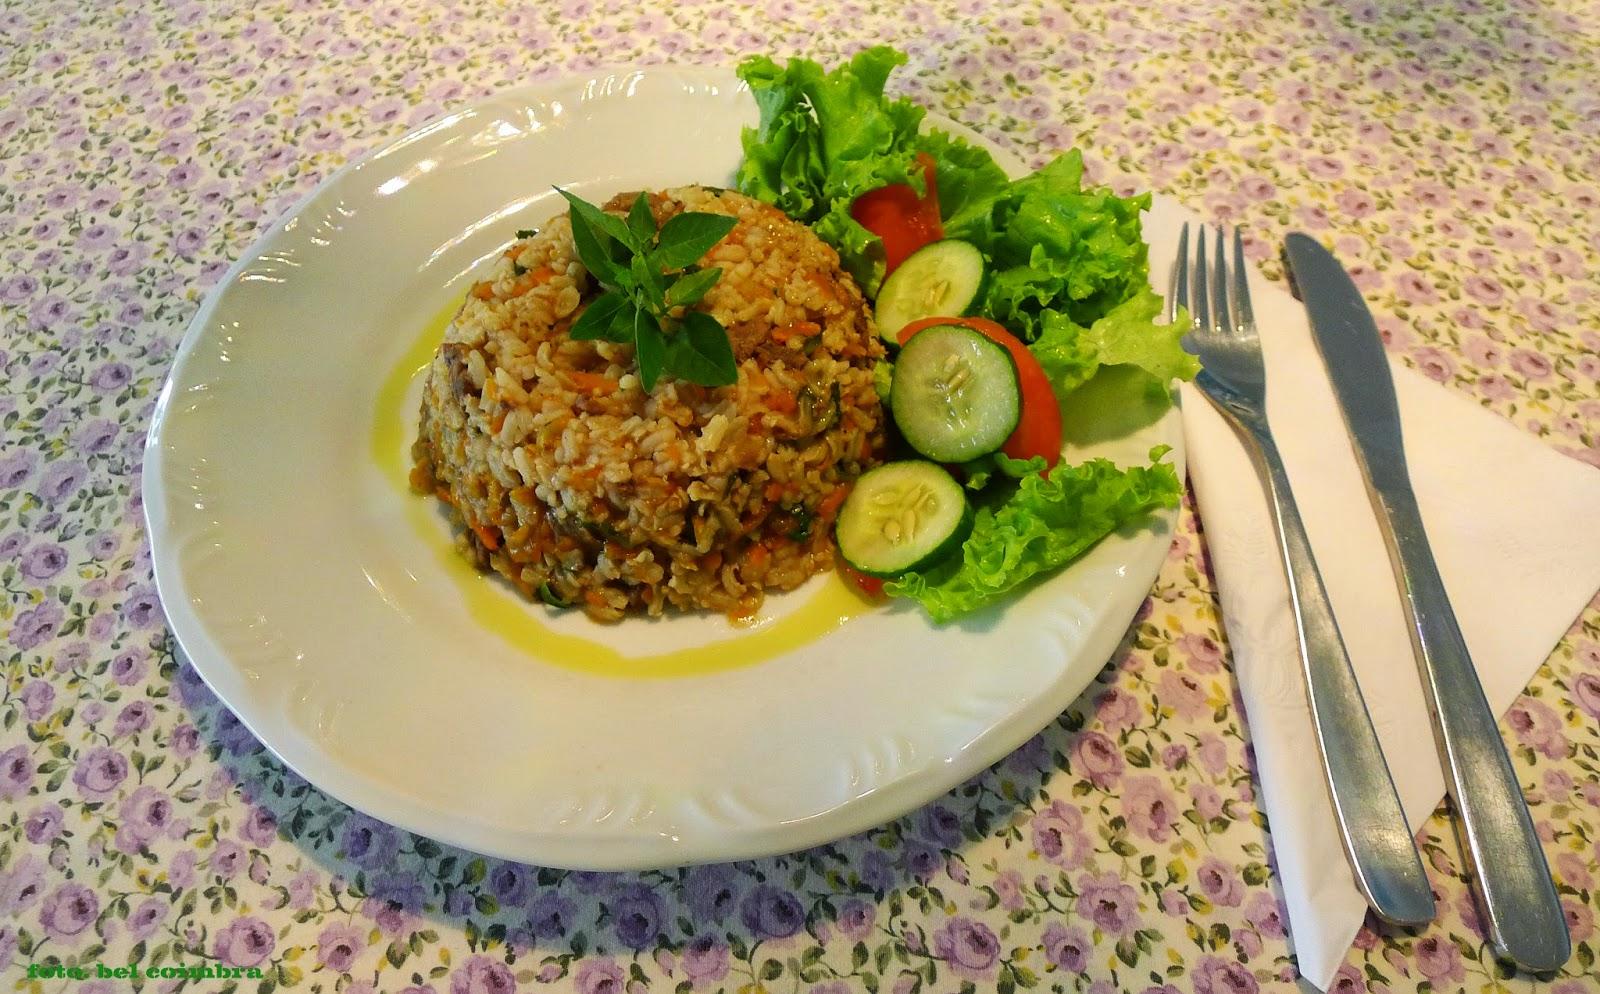 Arquiteta arteira risotto arroz integral - Risotto arroz integral ...